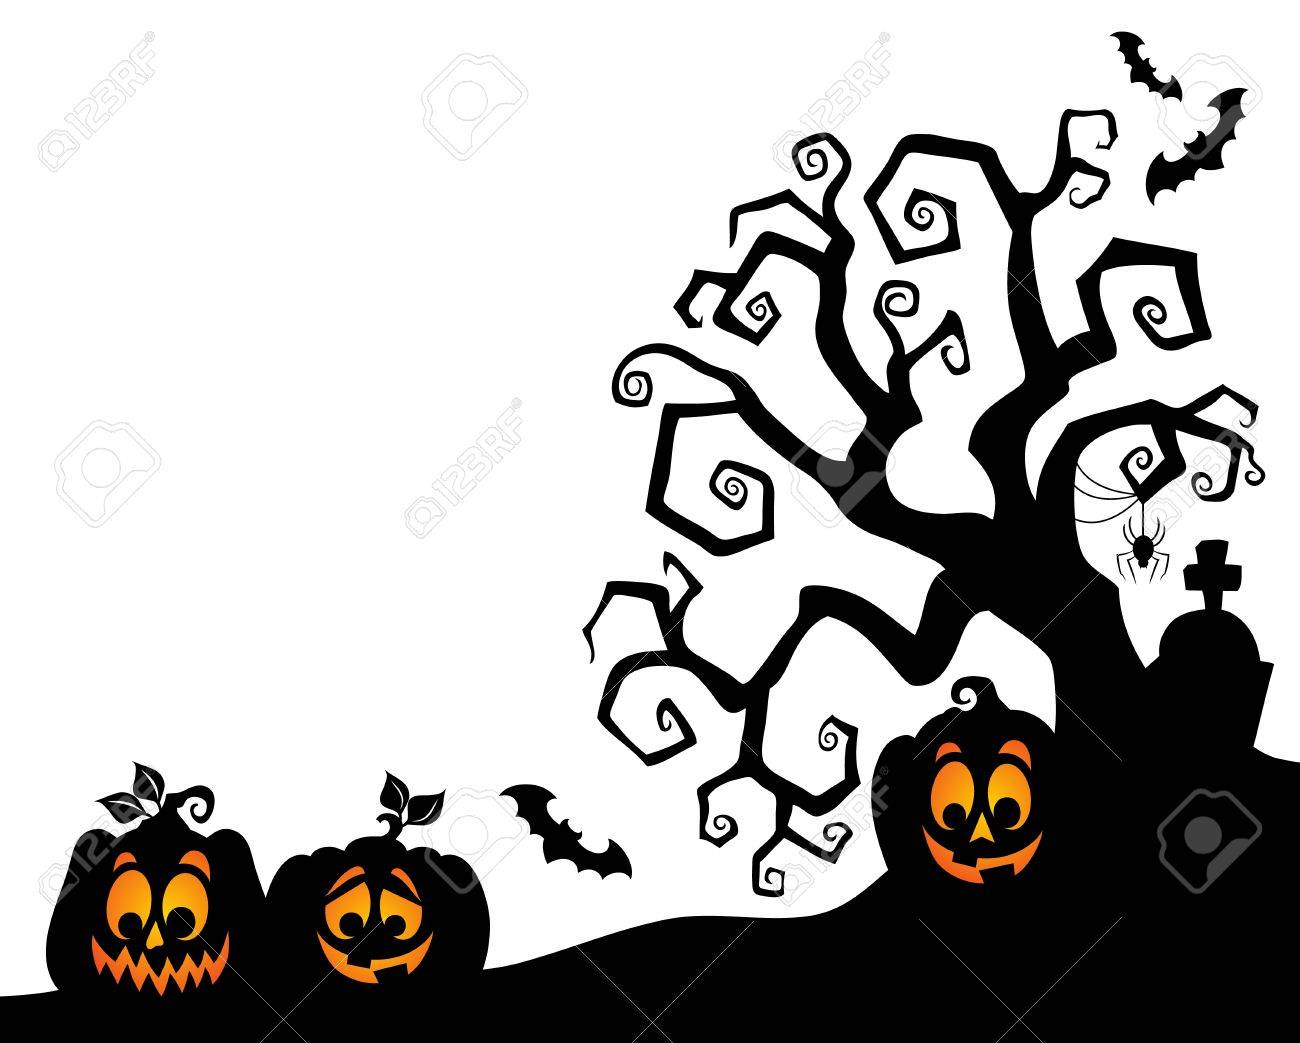 halloween tree silhouette stock vector 61009476